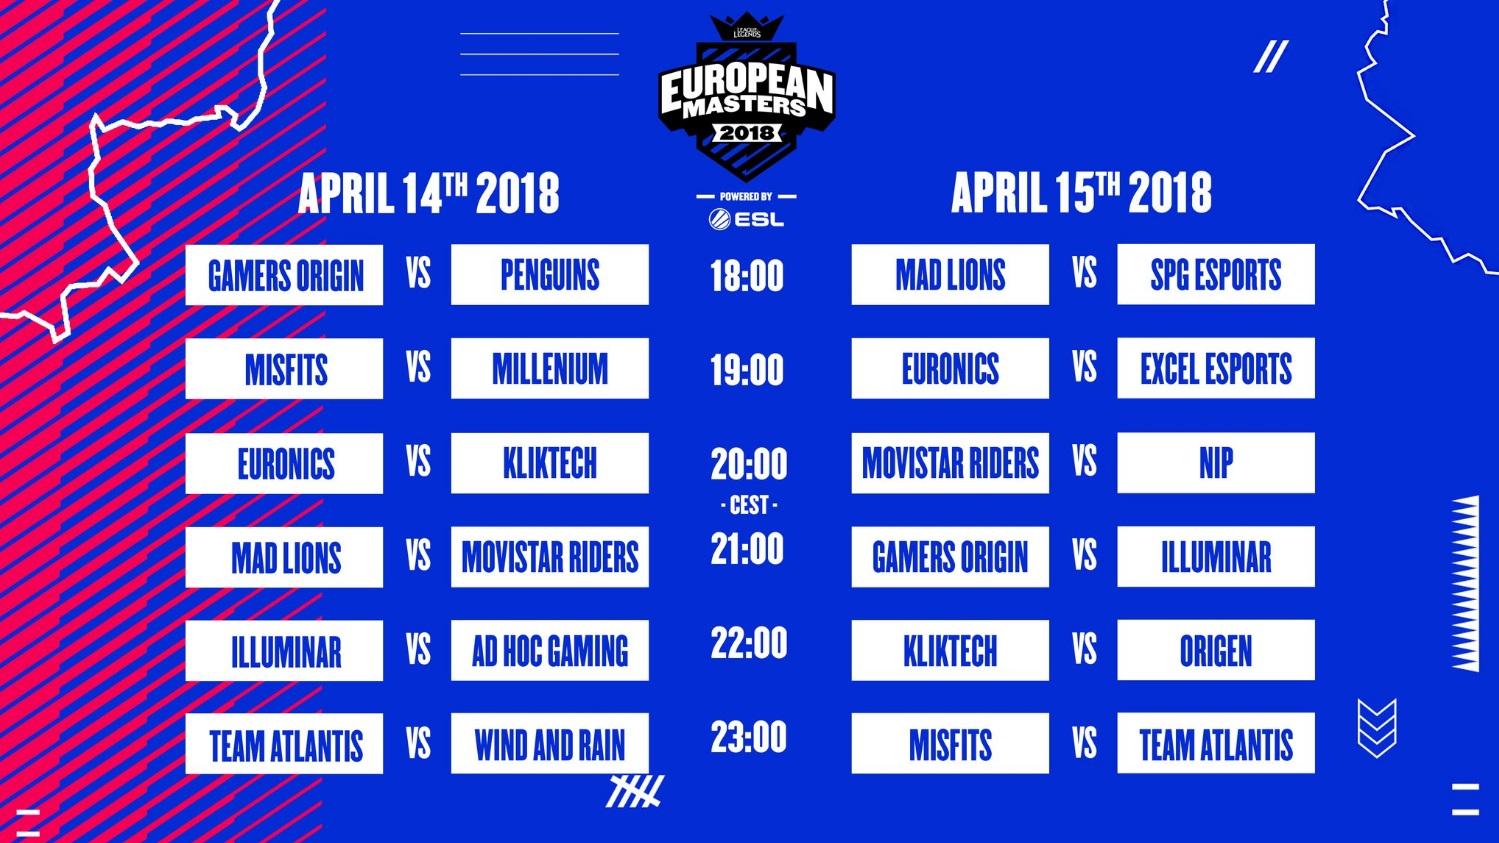 European Masters Grupos